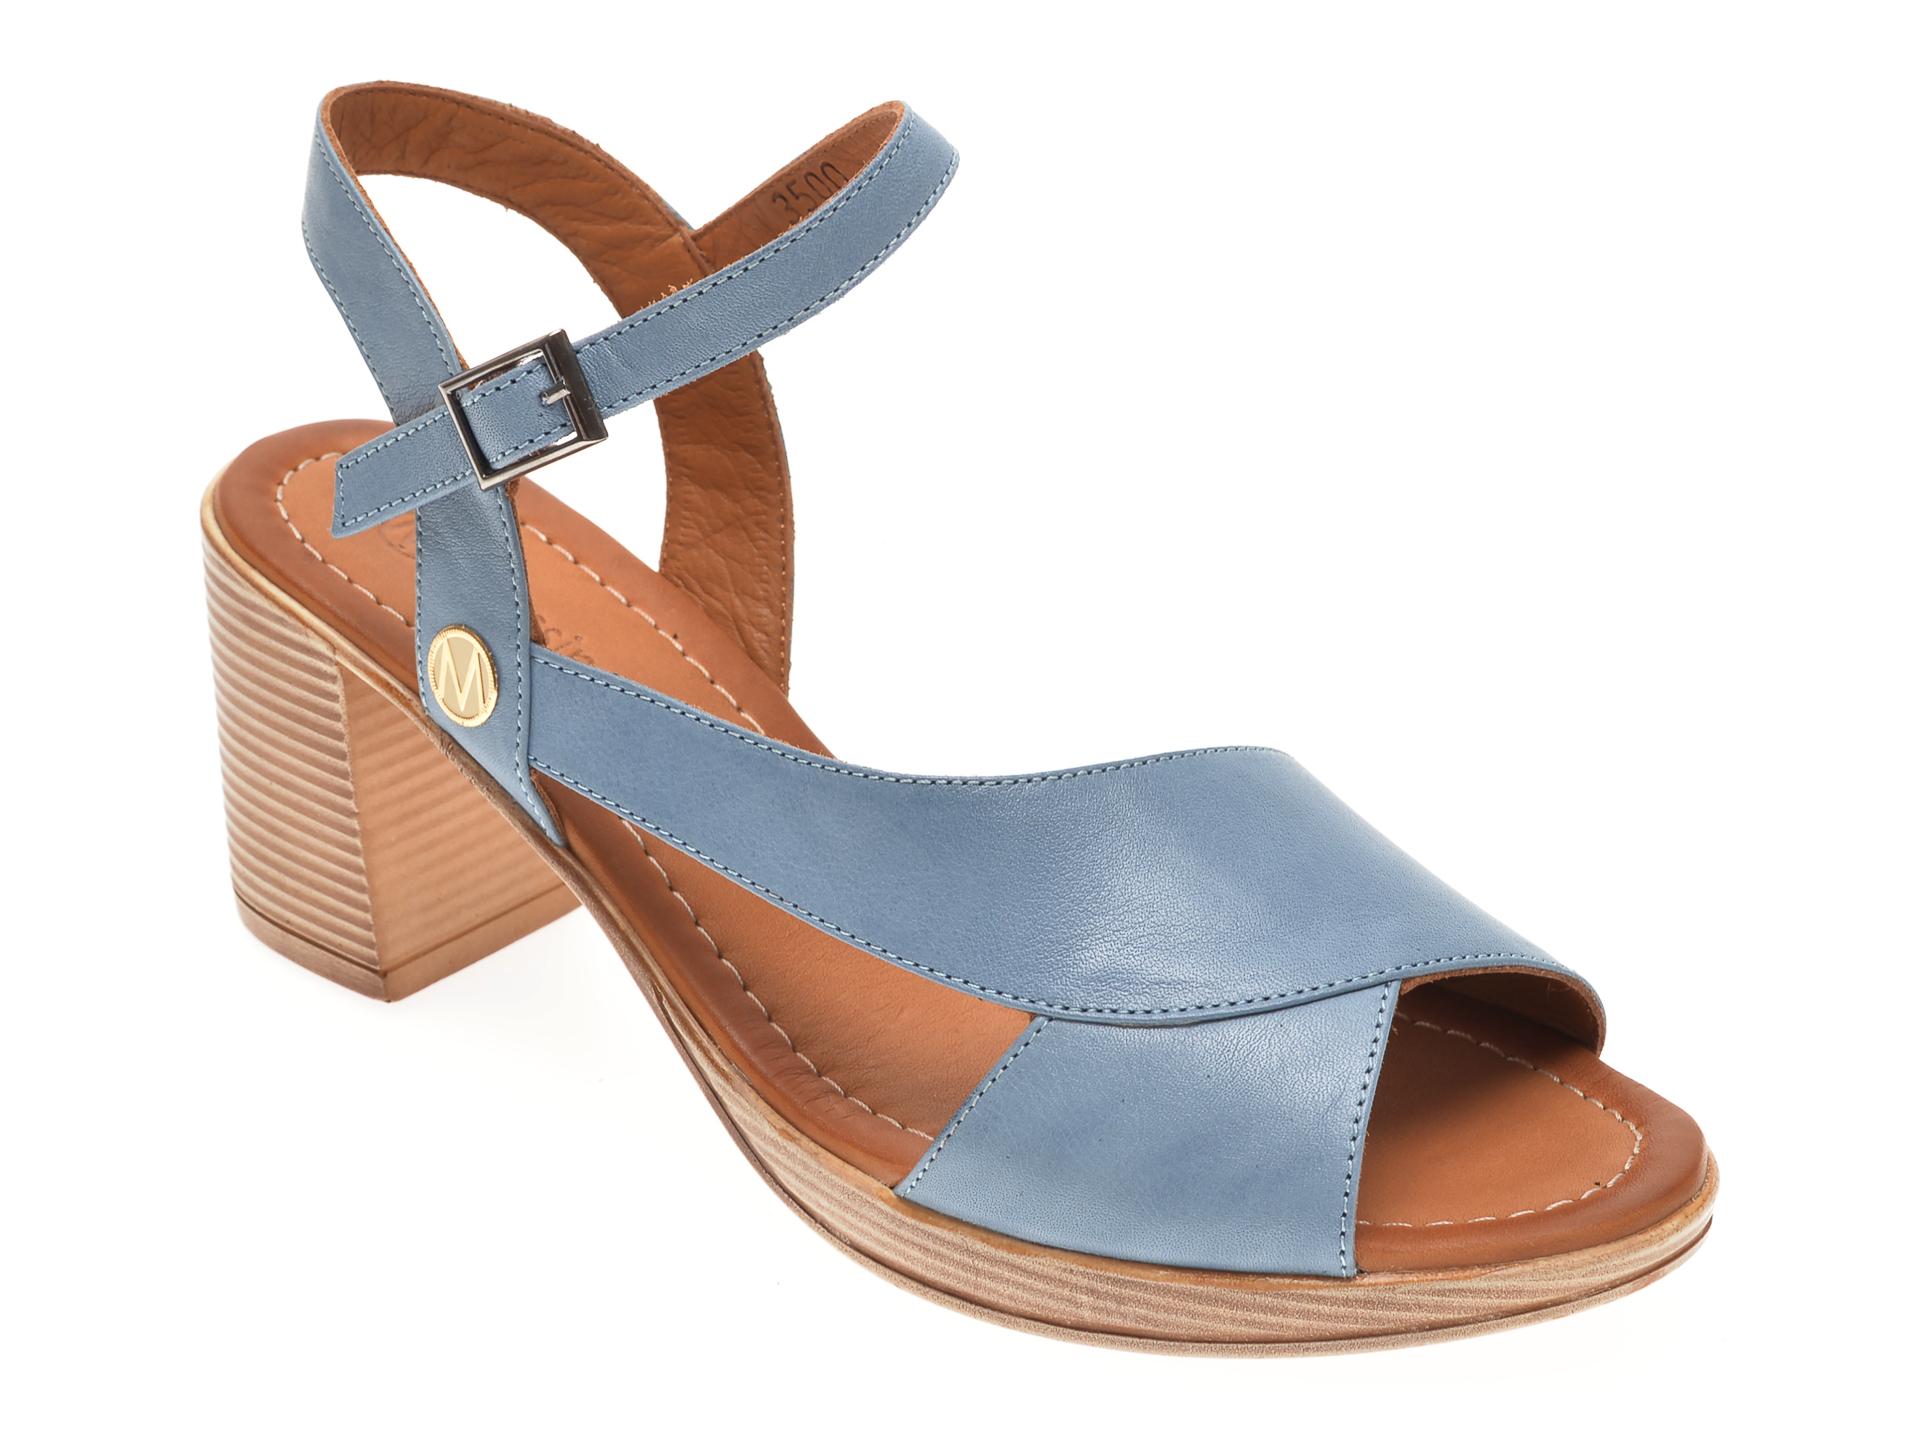 Sandale MESSIMODA albastre, 20Y3500, din piele naturala